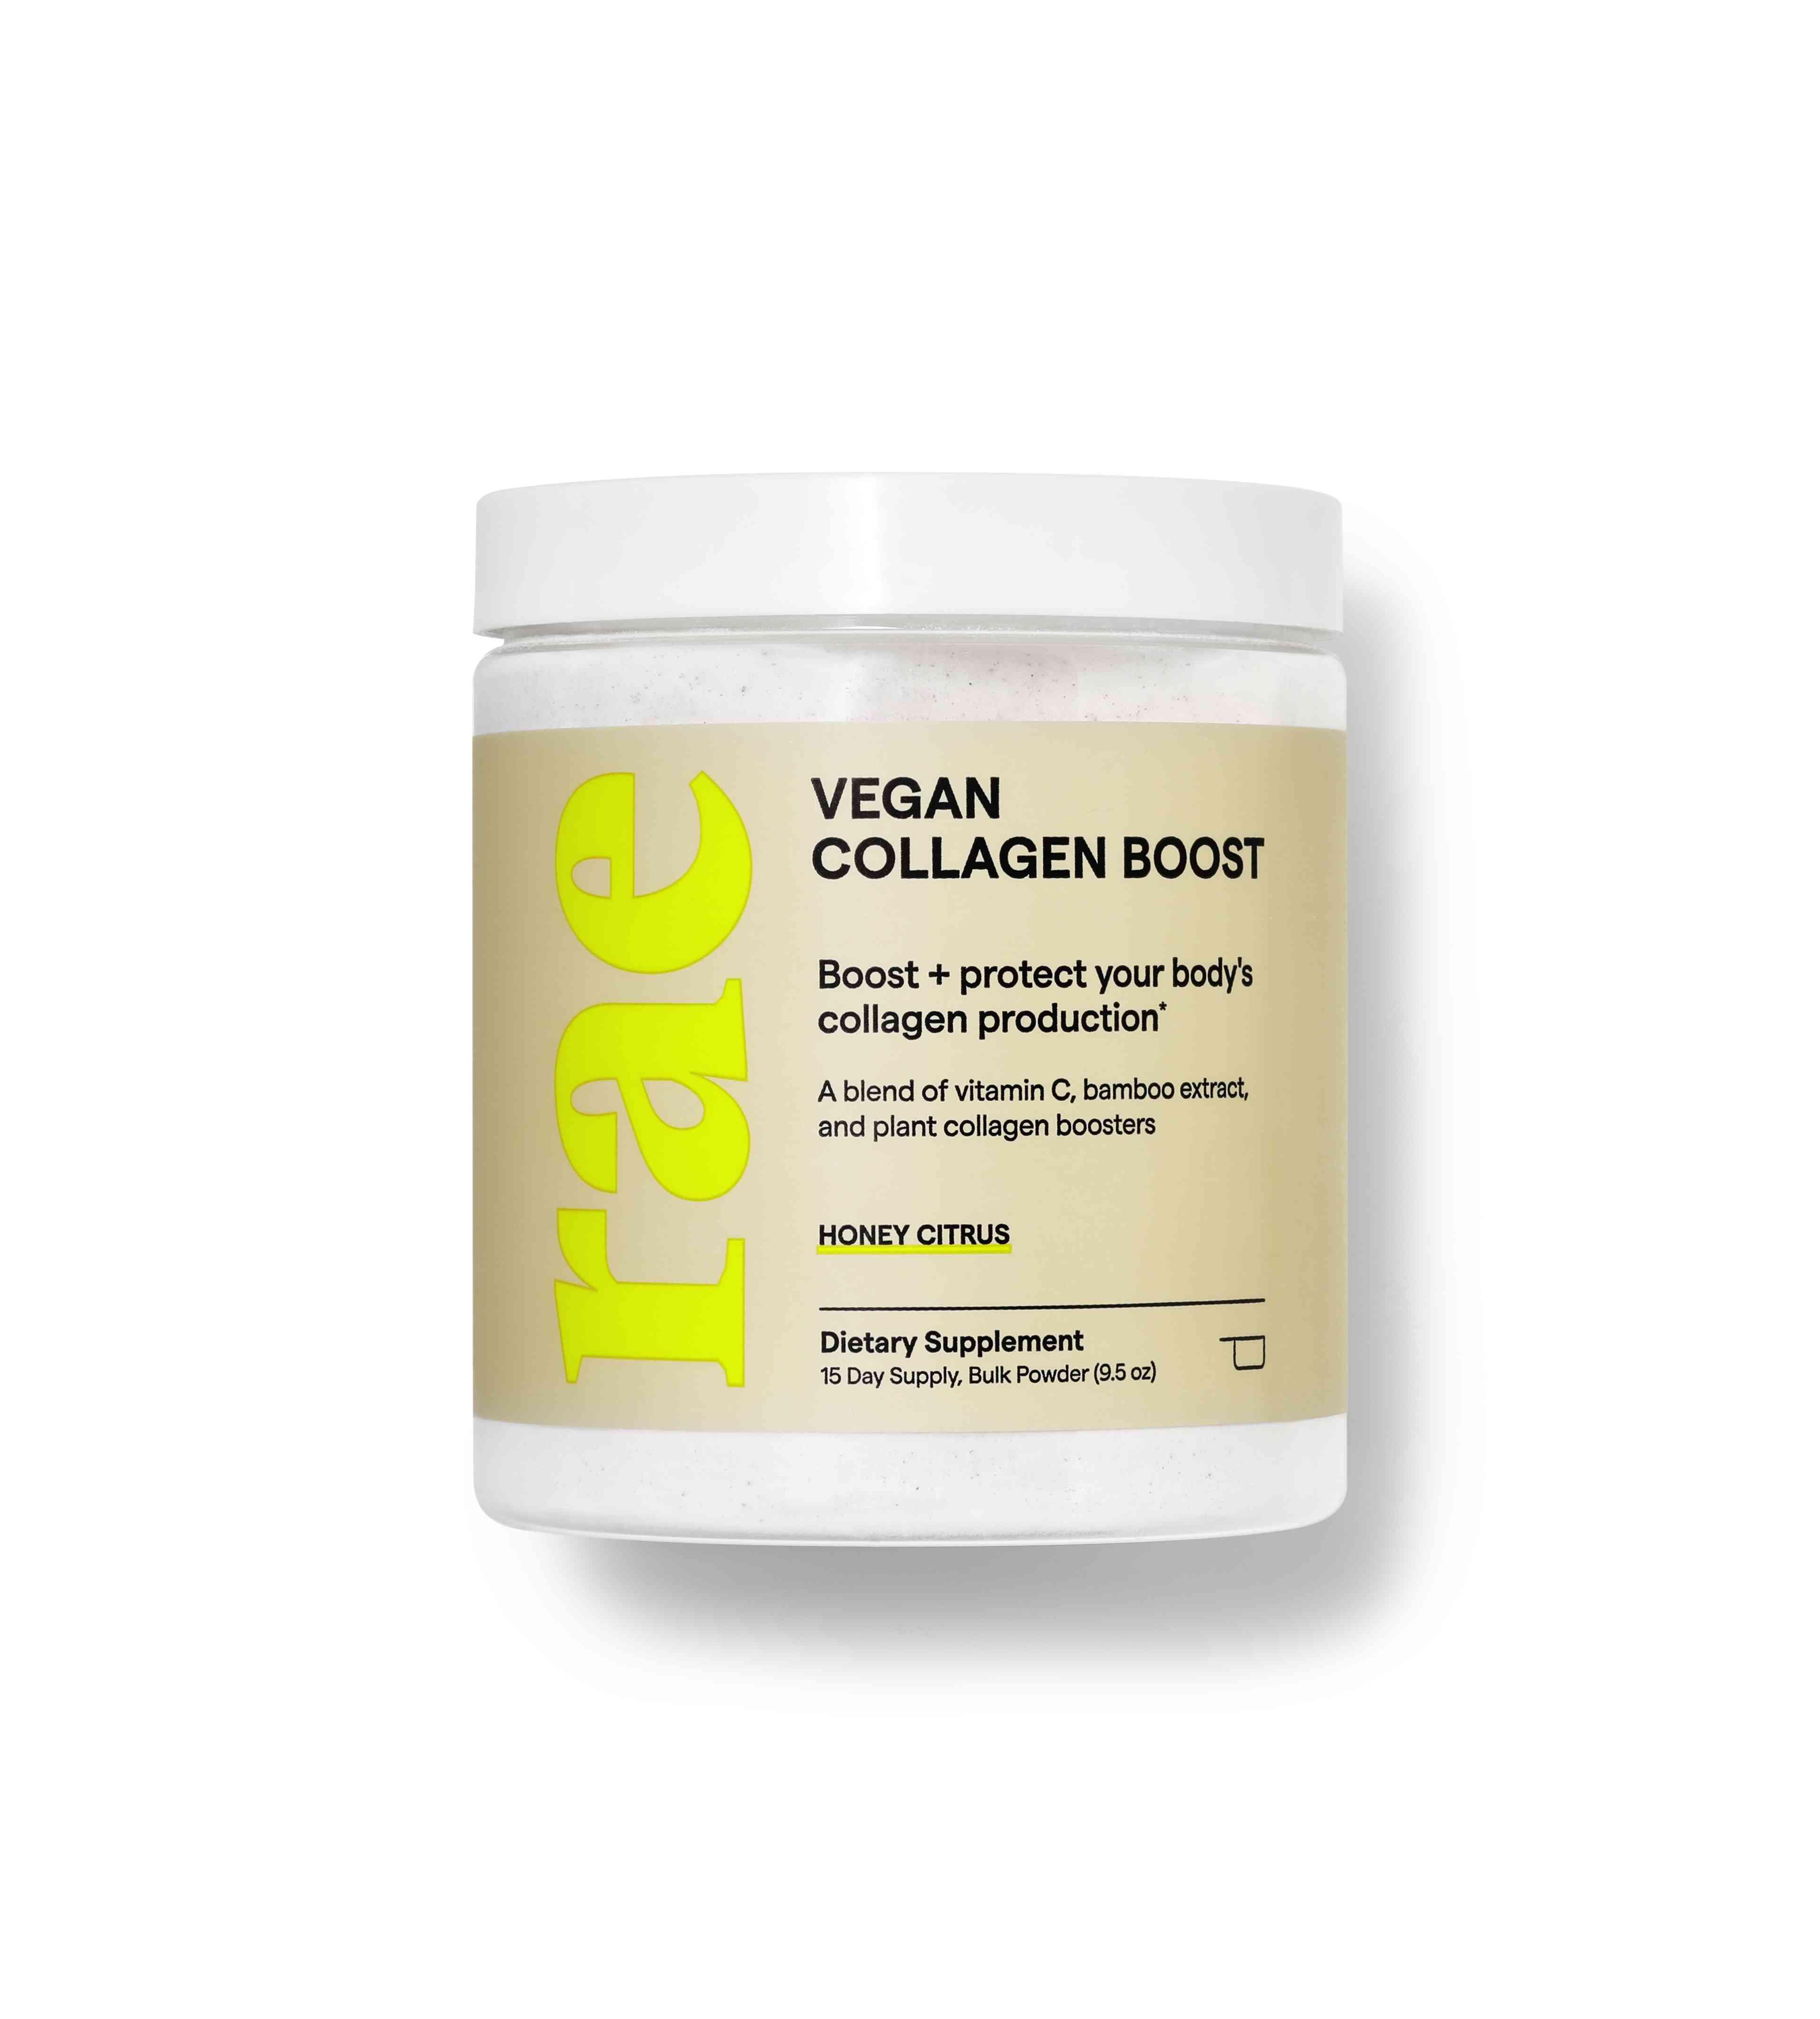 Vegan Collagen Boost Powder - Honey Citrus